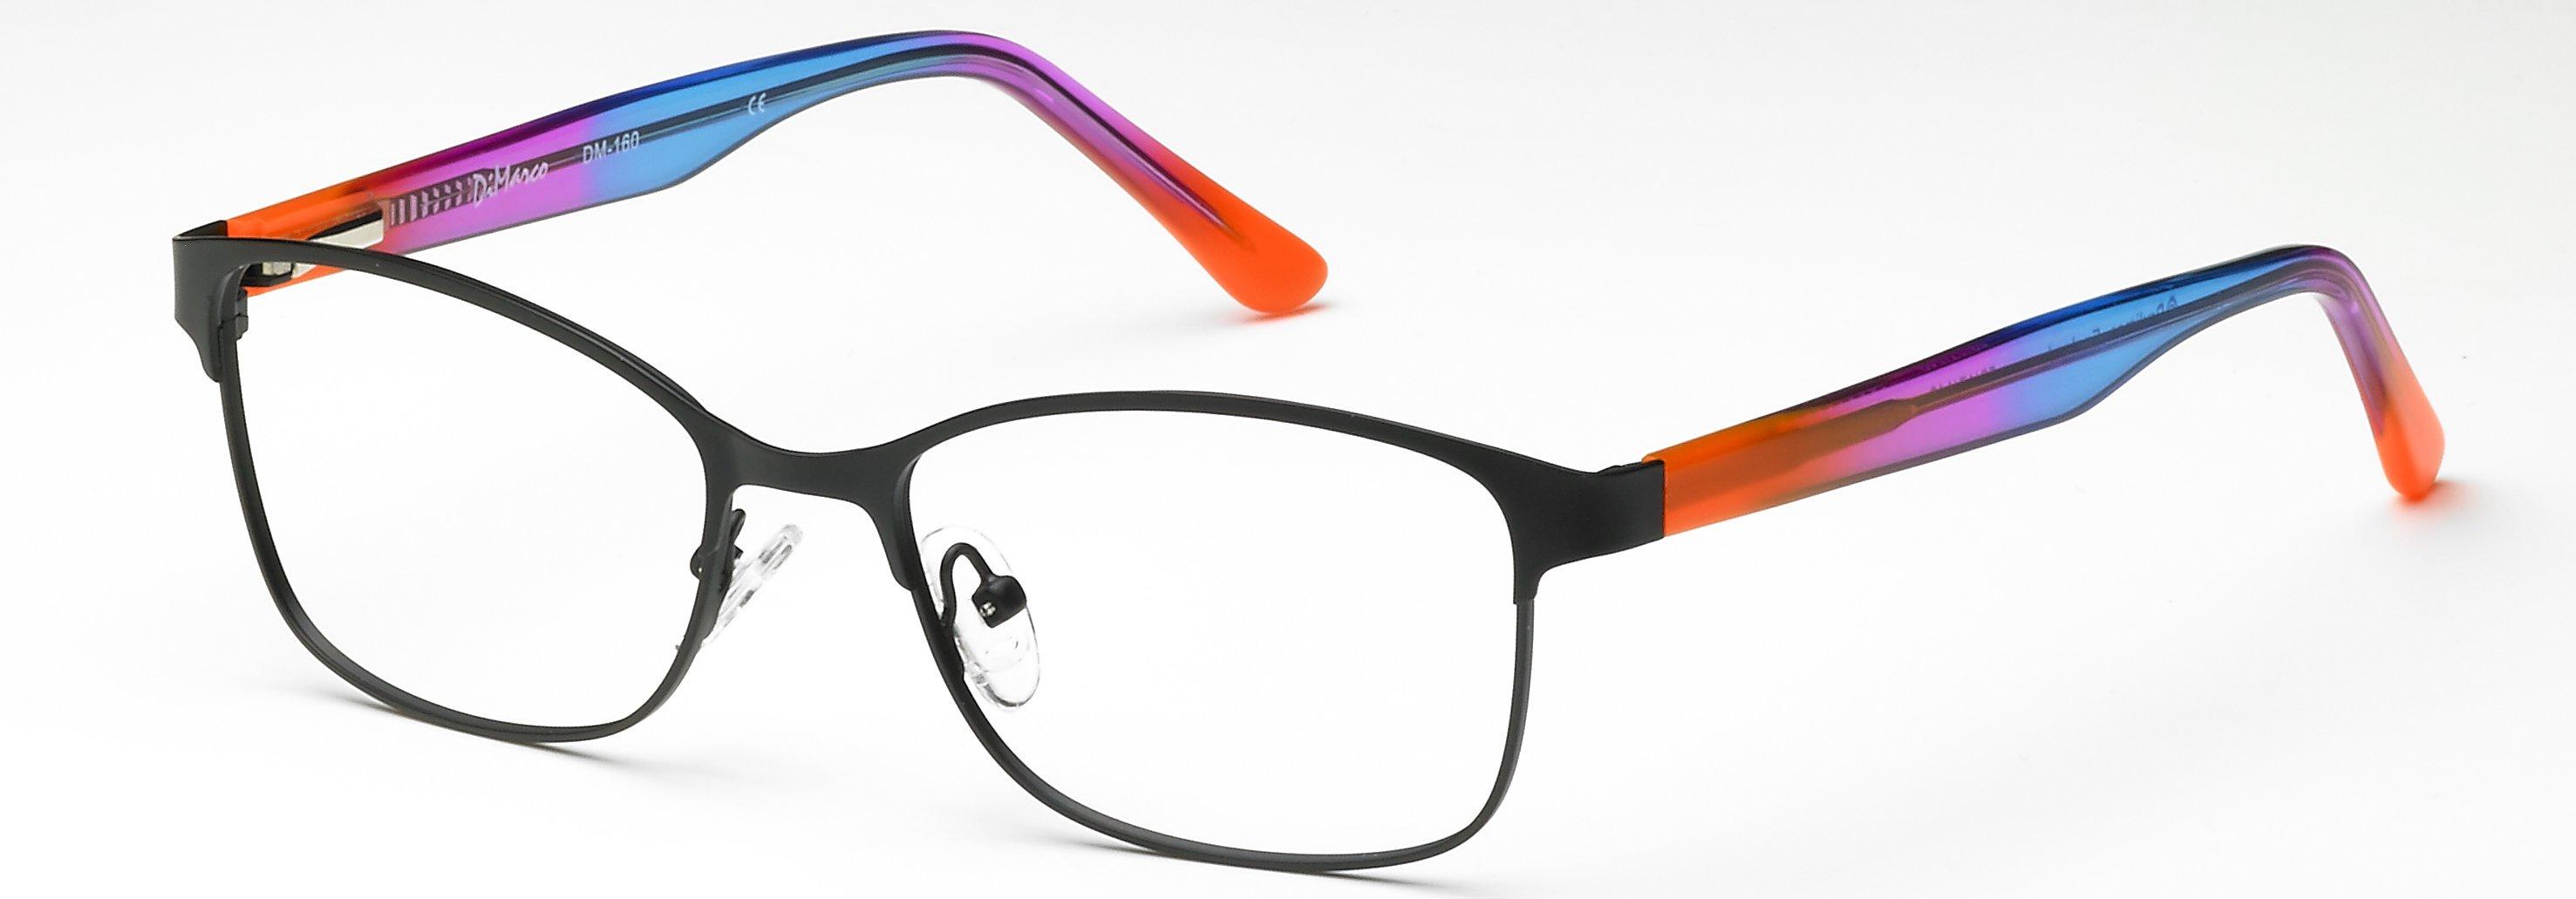 Bowden Opticians Barbour Glasses